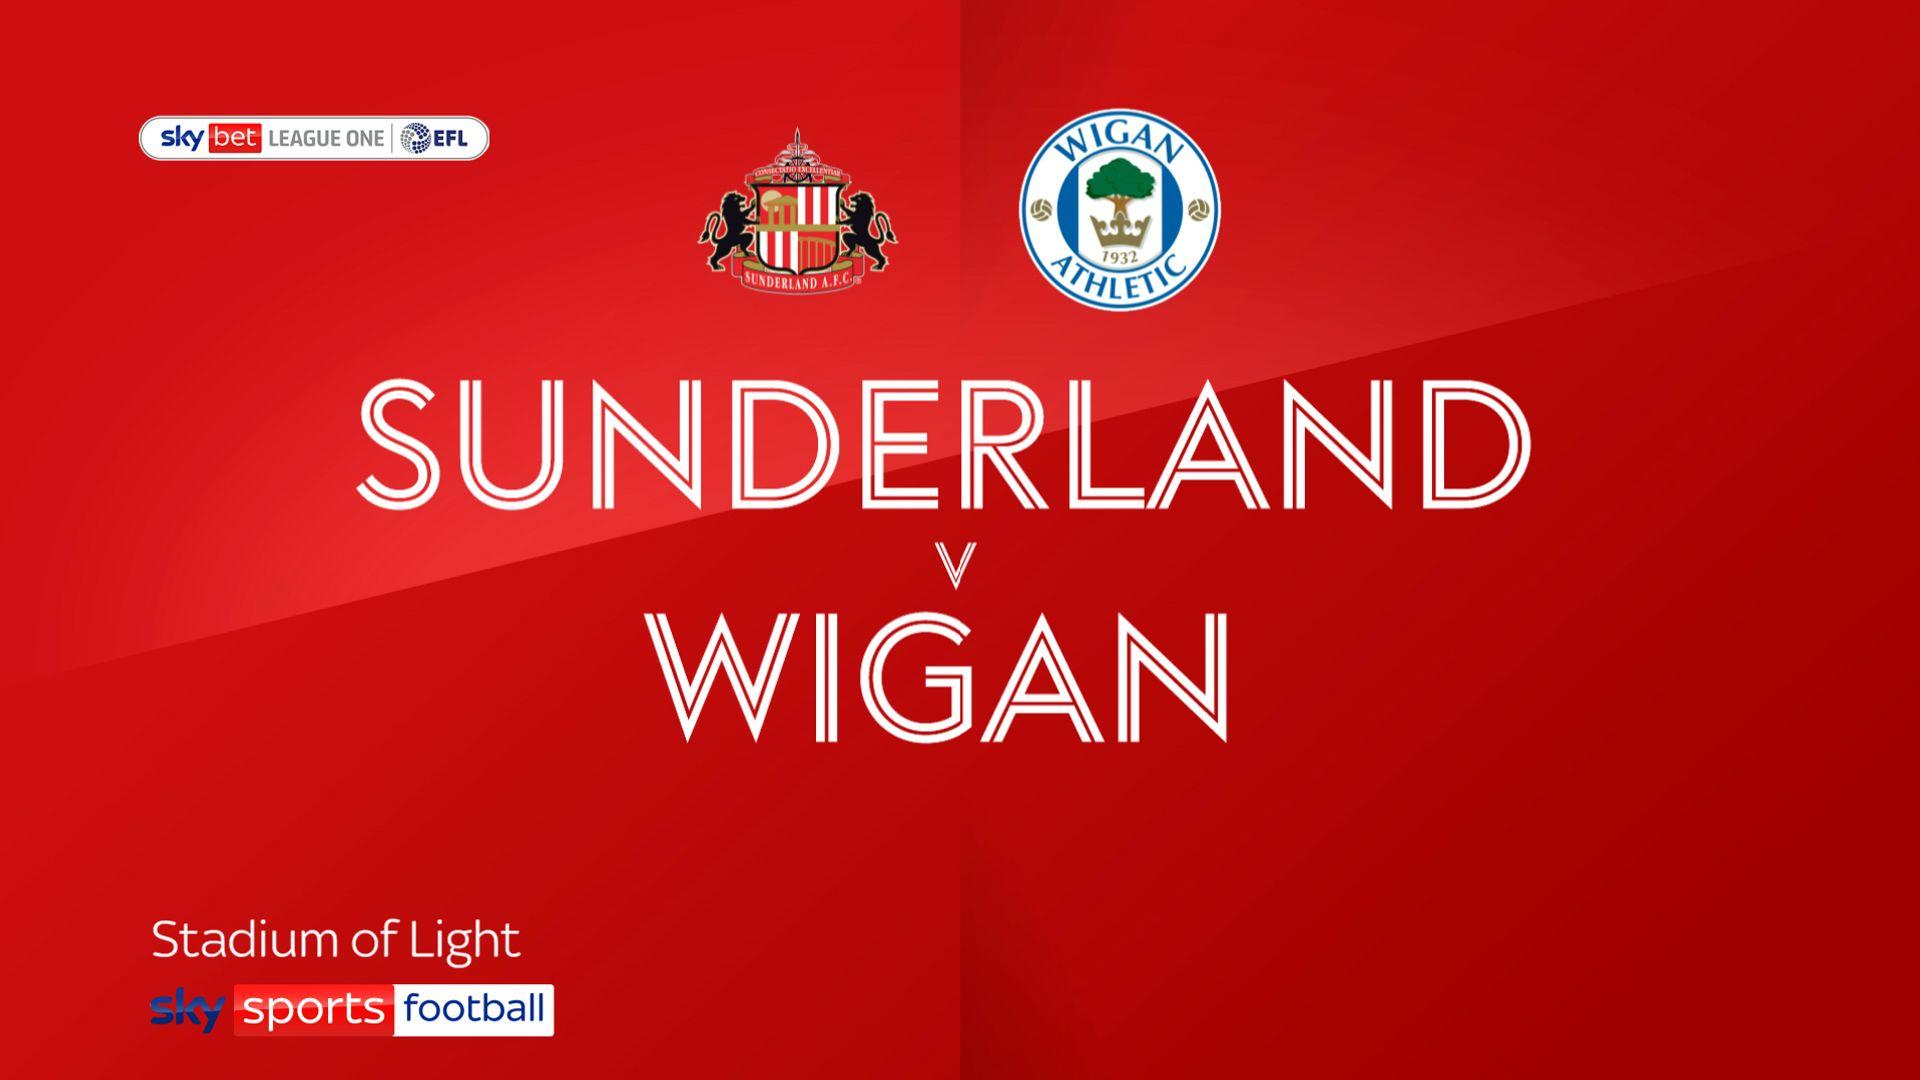 Sunderland rally to beat Wigan